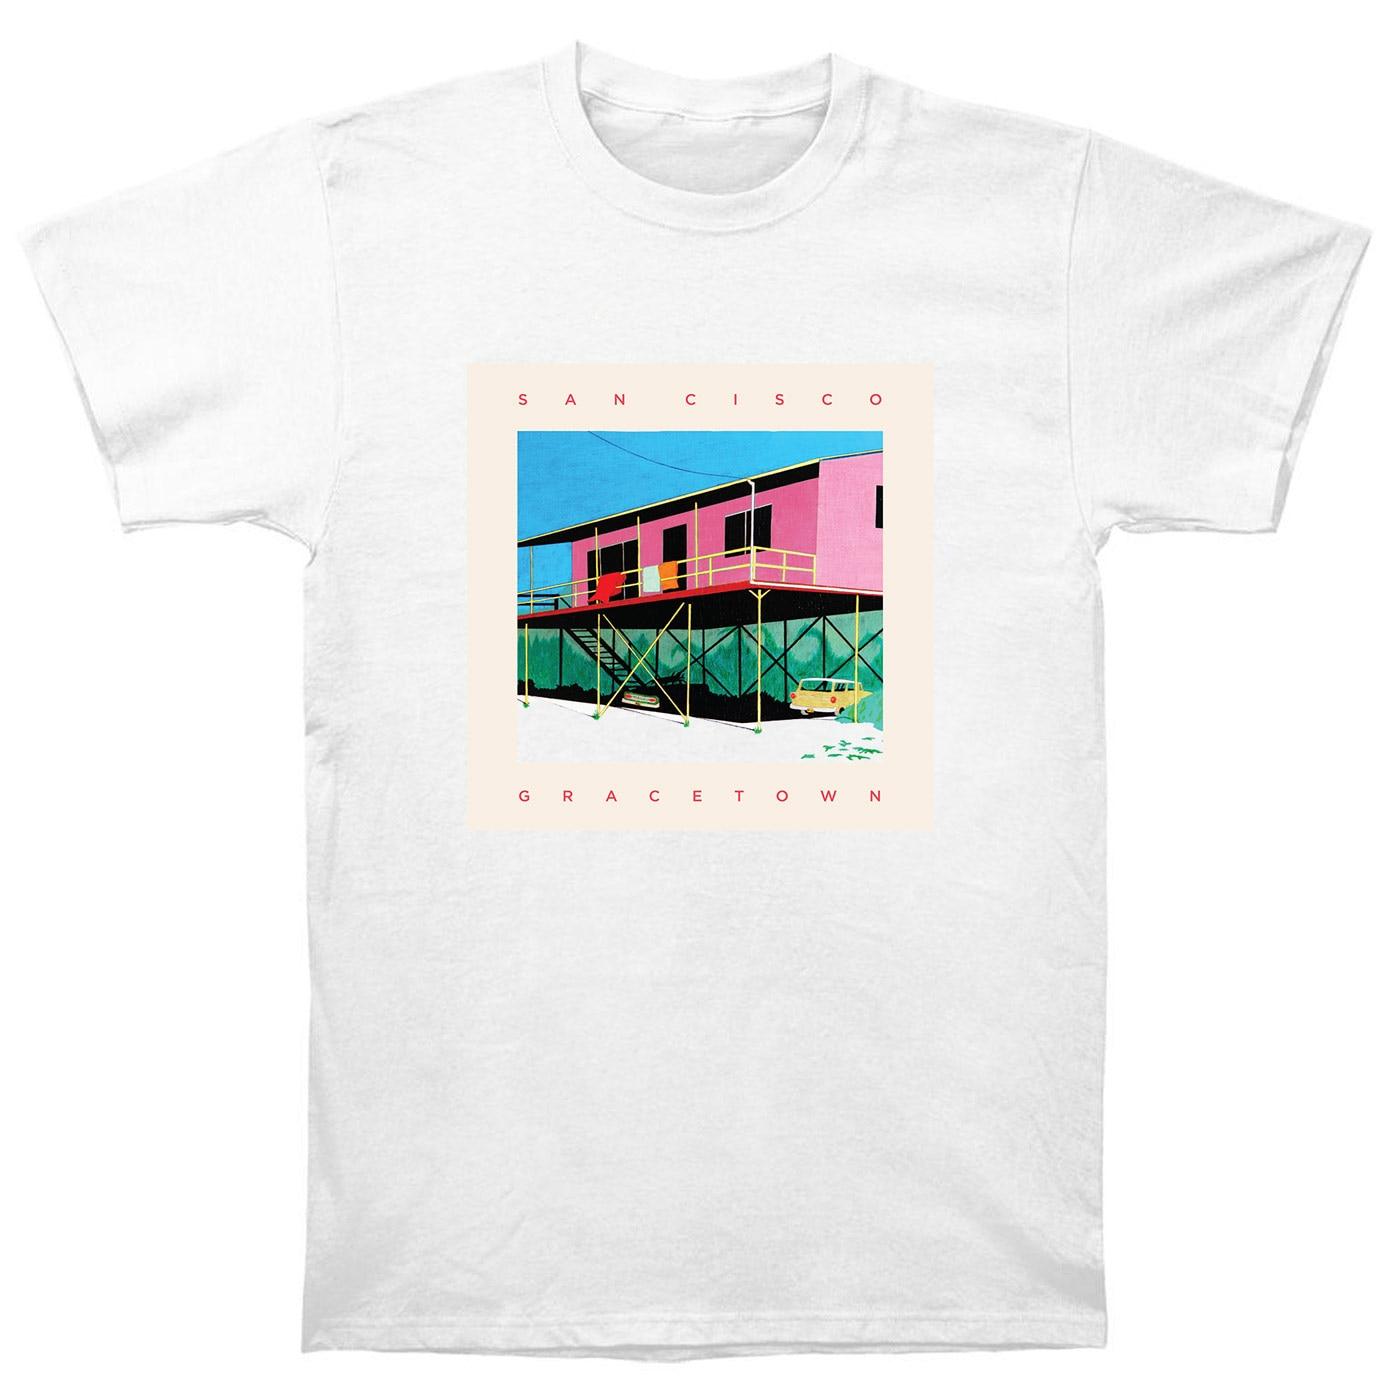 Cisco clothing store